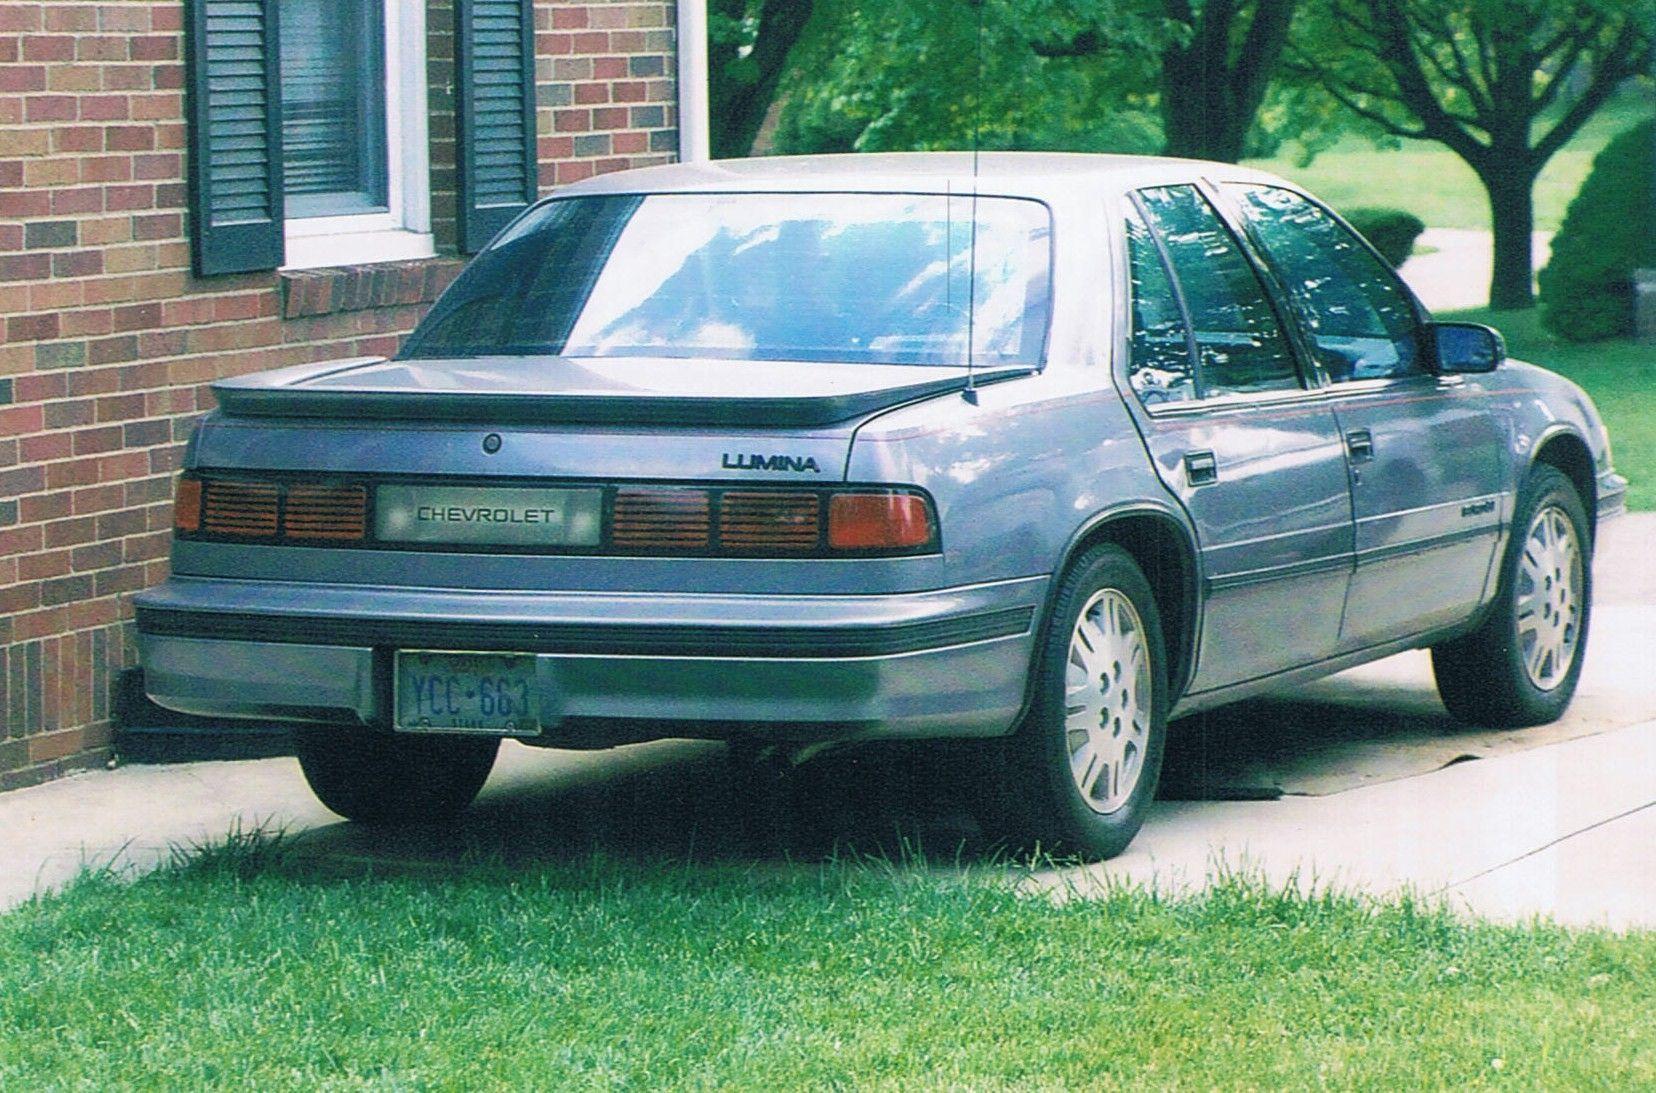 Worksheet. 1991 Chevy Lumina Euro 31  Chevrolet Lumina  Pinterest